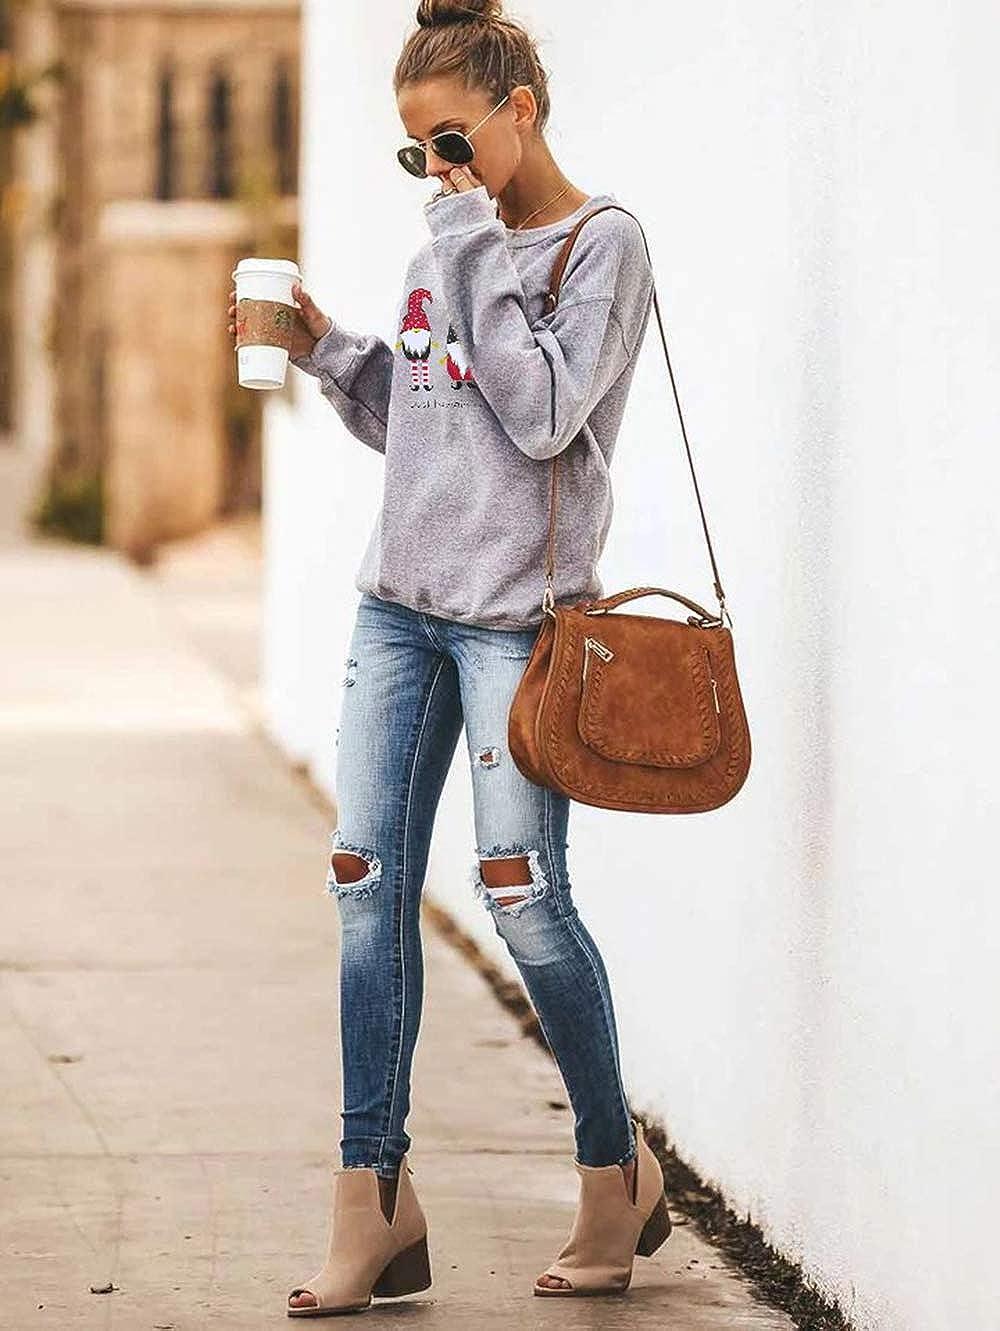 Barlver Womens Christmas Fleece Pullover Sweatshirts Holiday Vacation Graphic Tees Tops